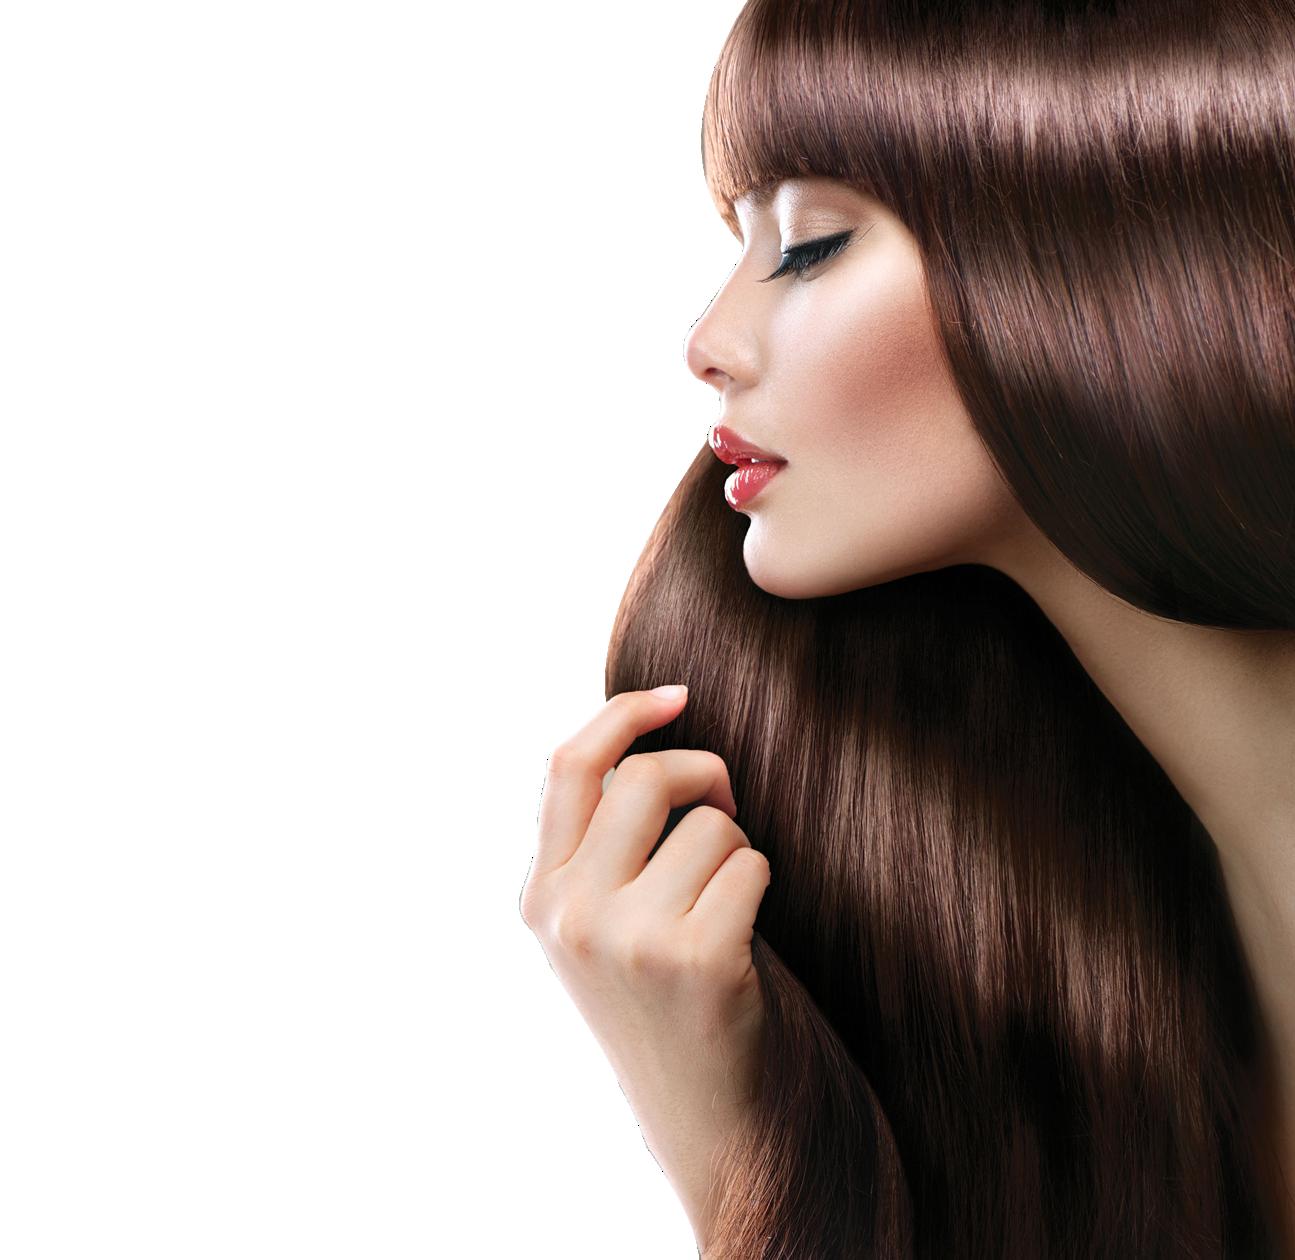 Exquisito peinados lisos Galería de cortes de pelo Ideas - Cabelos longo liso   Peinados lisos, Pelo liso, Ideas de ...